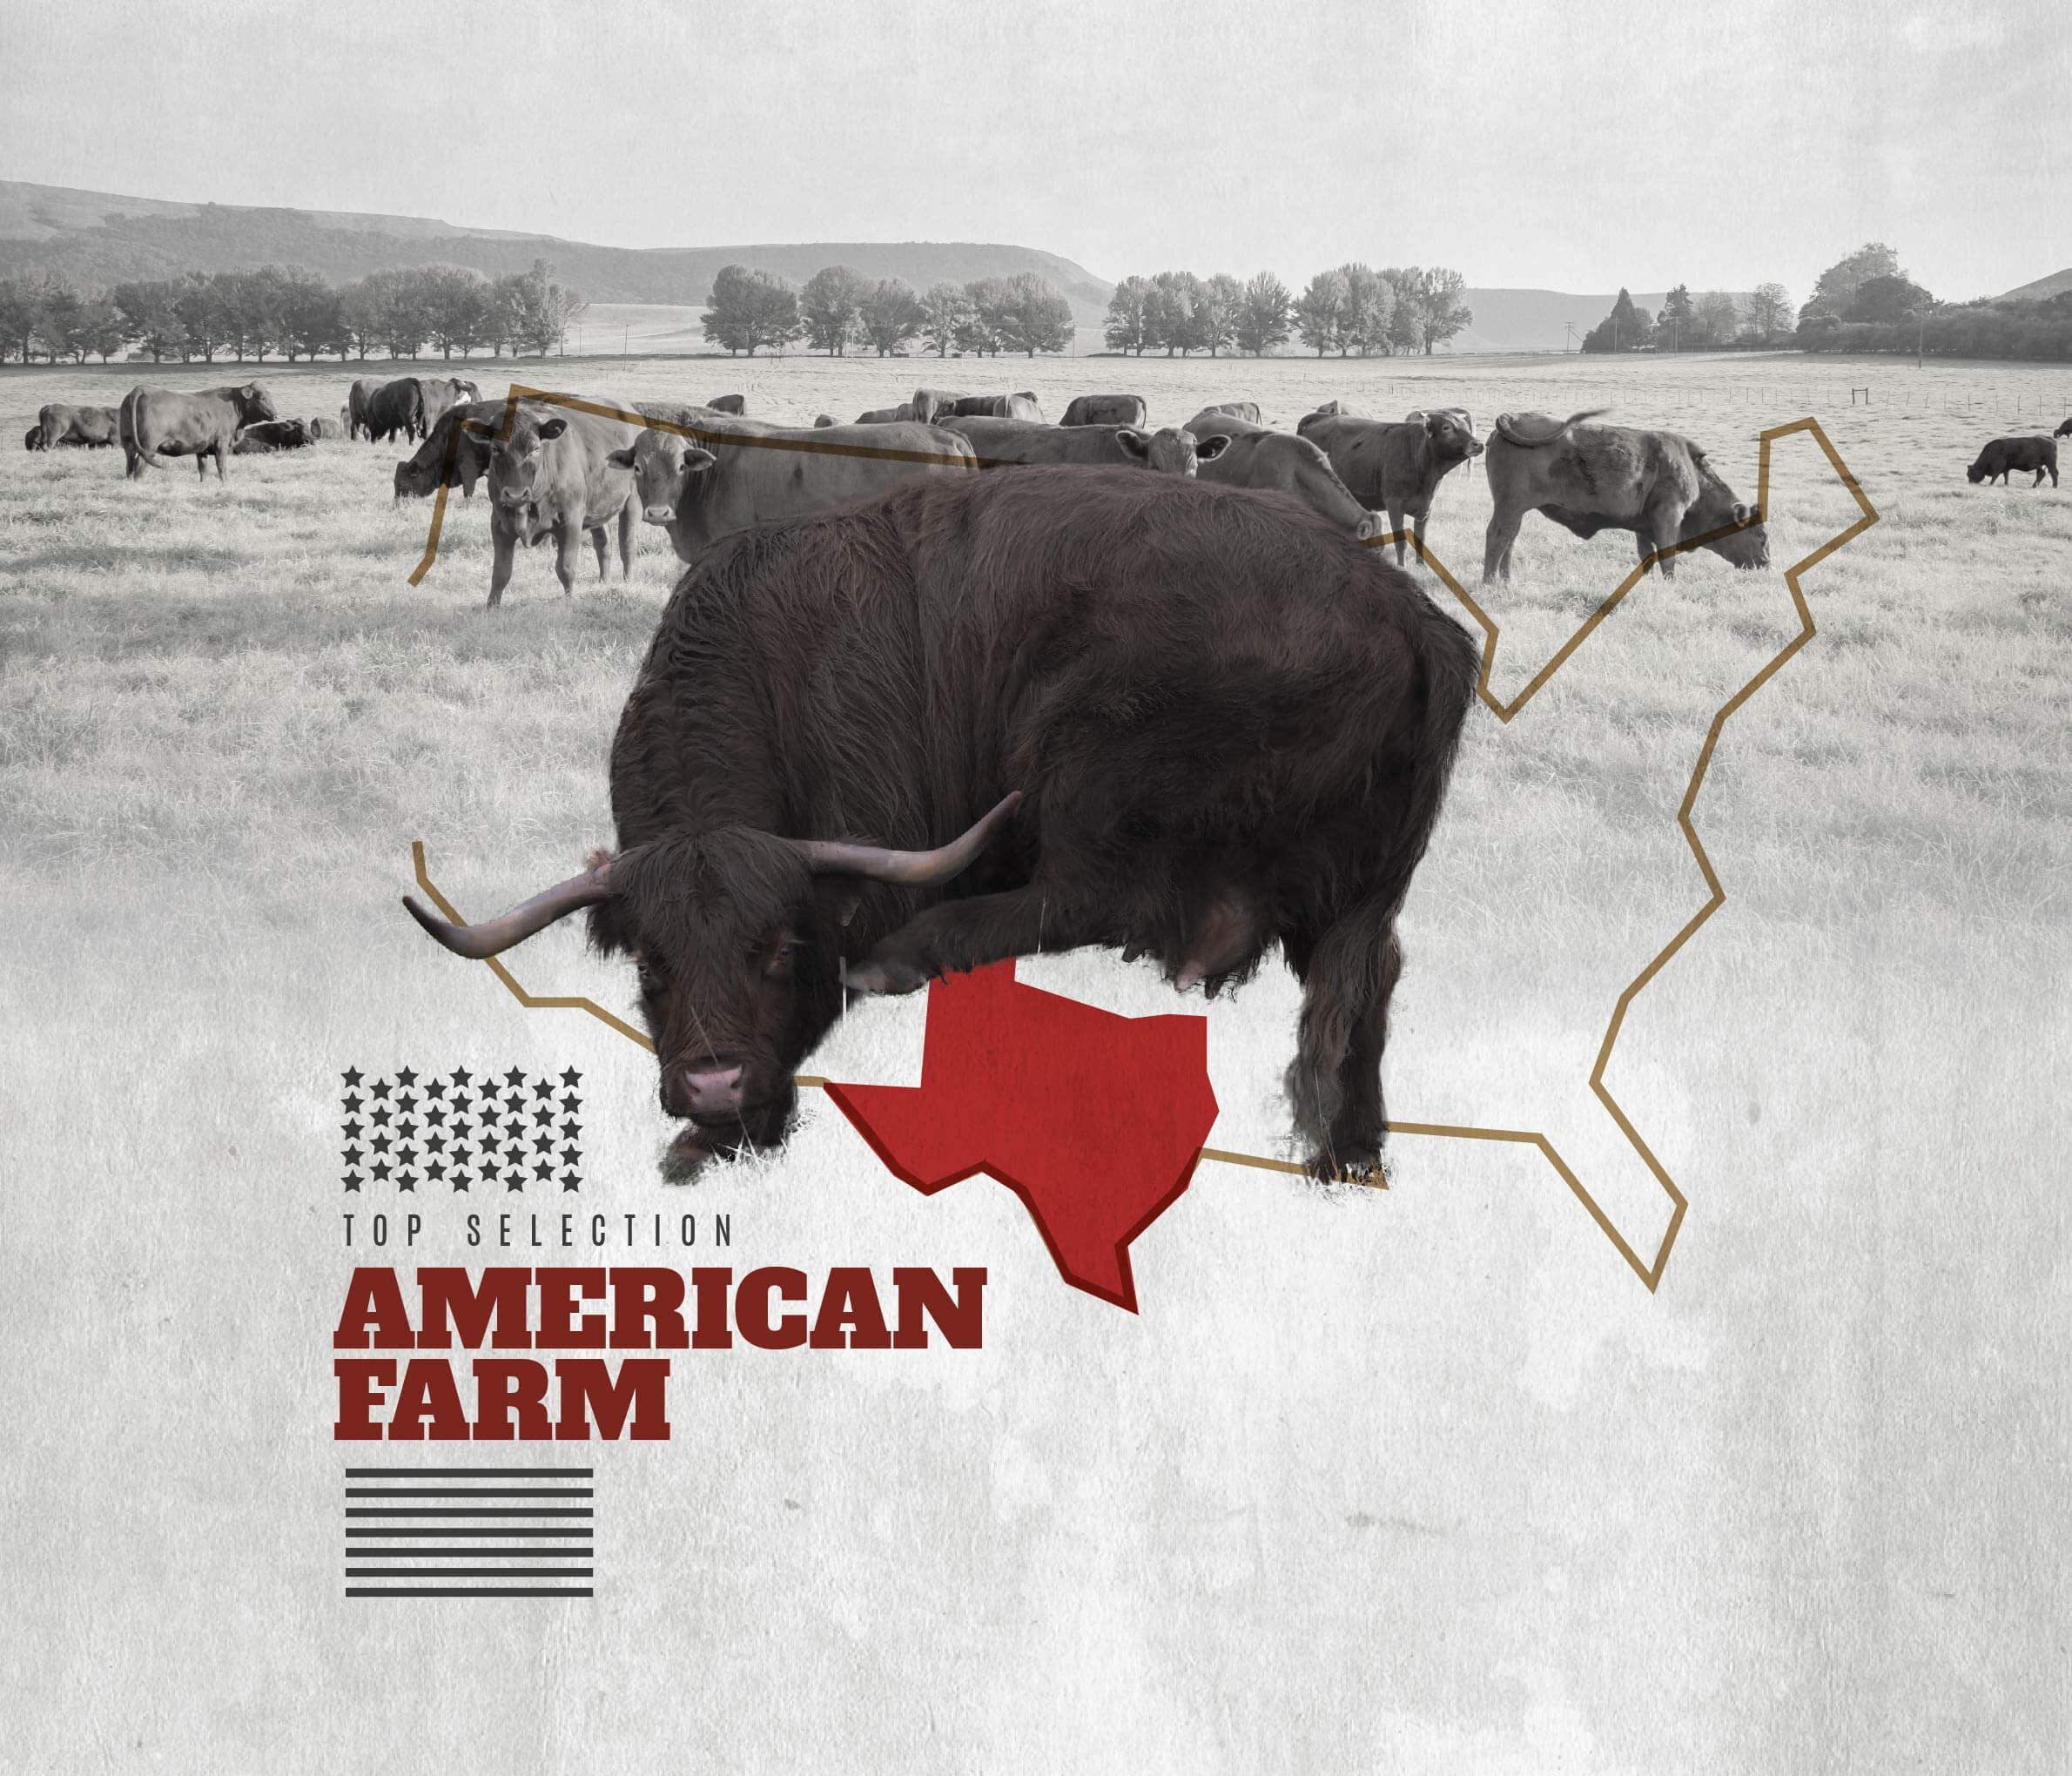 Top Selection - American Farm